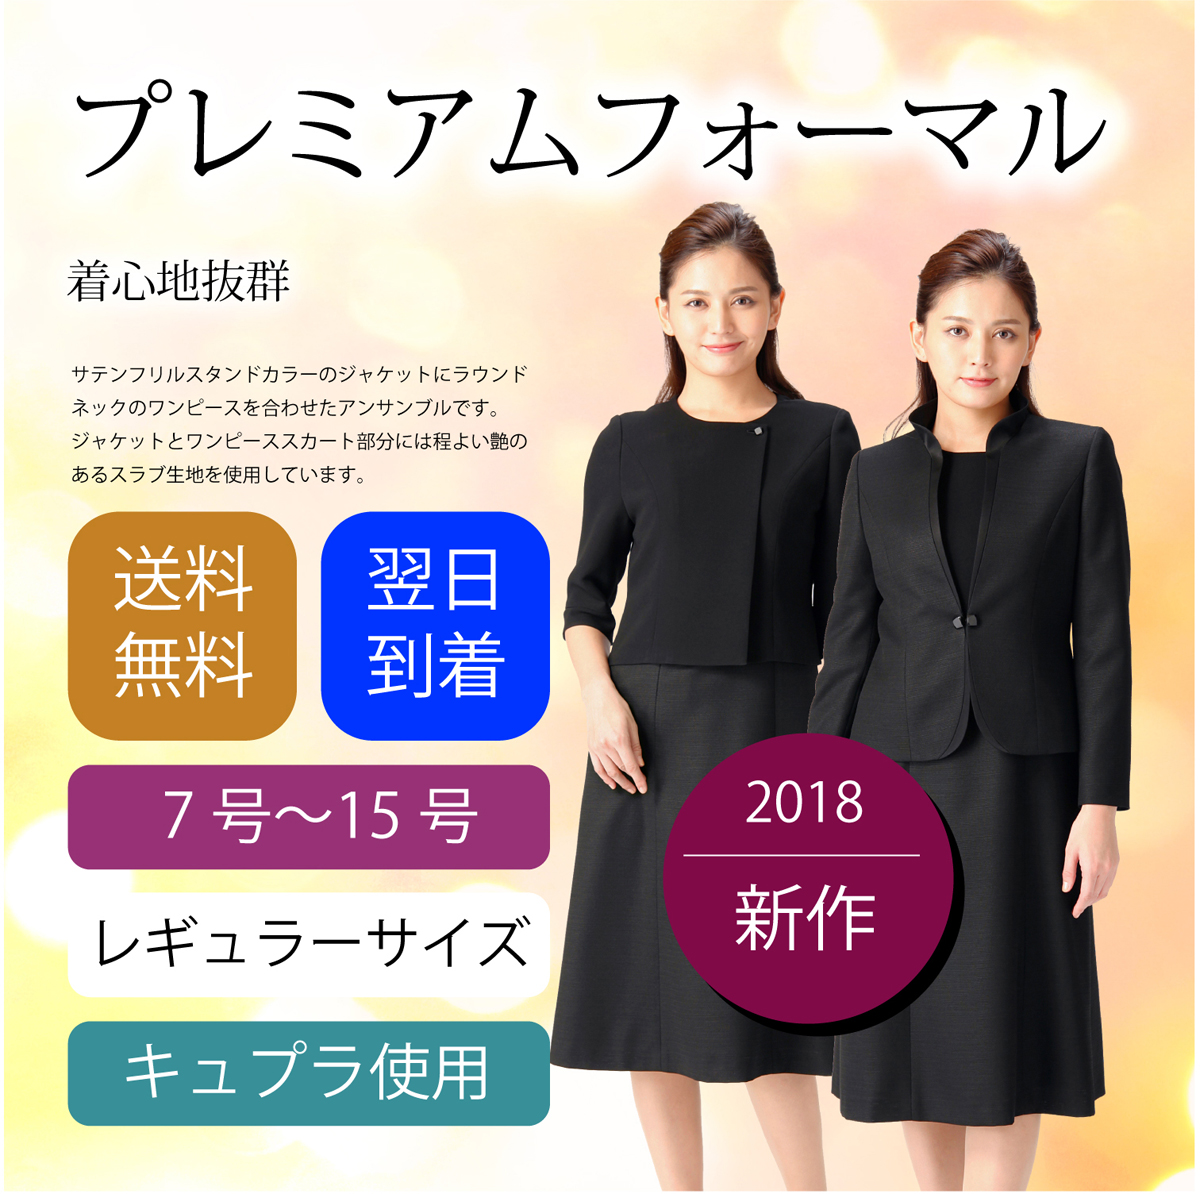 51ae784d596f9 ブラックフォーマル 喪服 女性 レディース 礼服  新商品  ブラックフォーマル  喪服